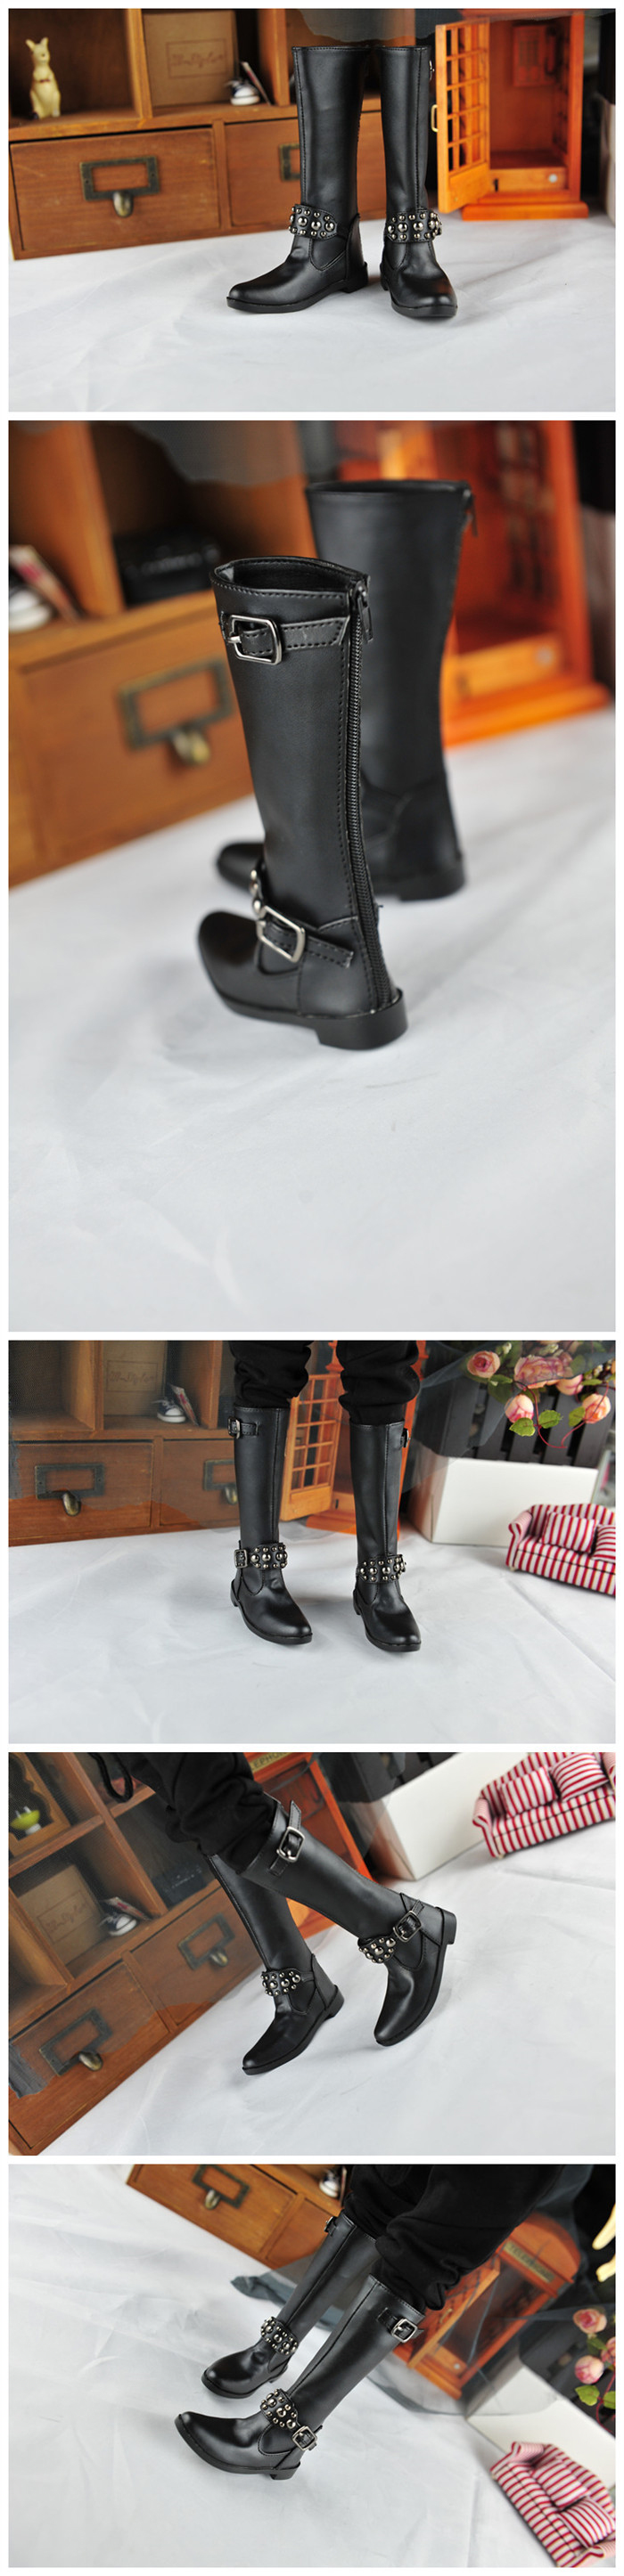 BJD靴  ドール靴 男用 人形靴 長ブーツ 1/3サイズ製品図3